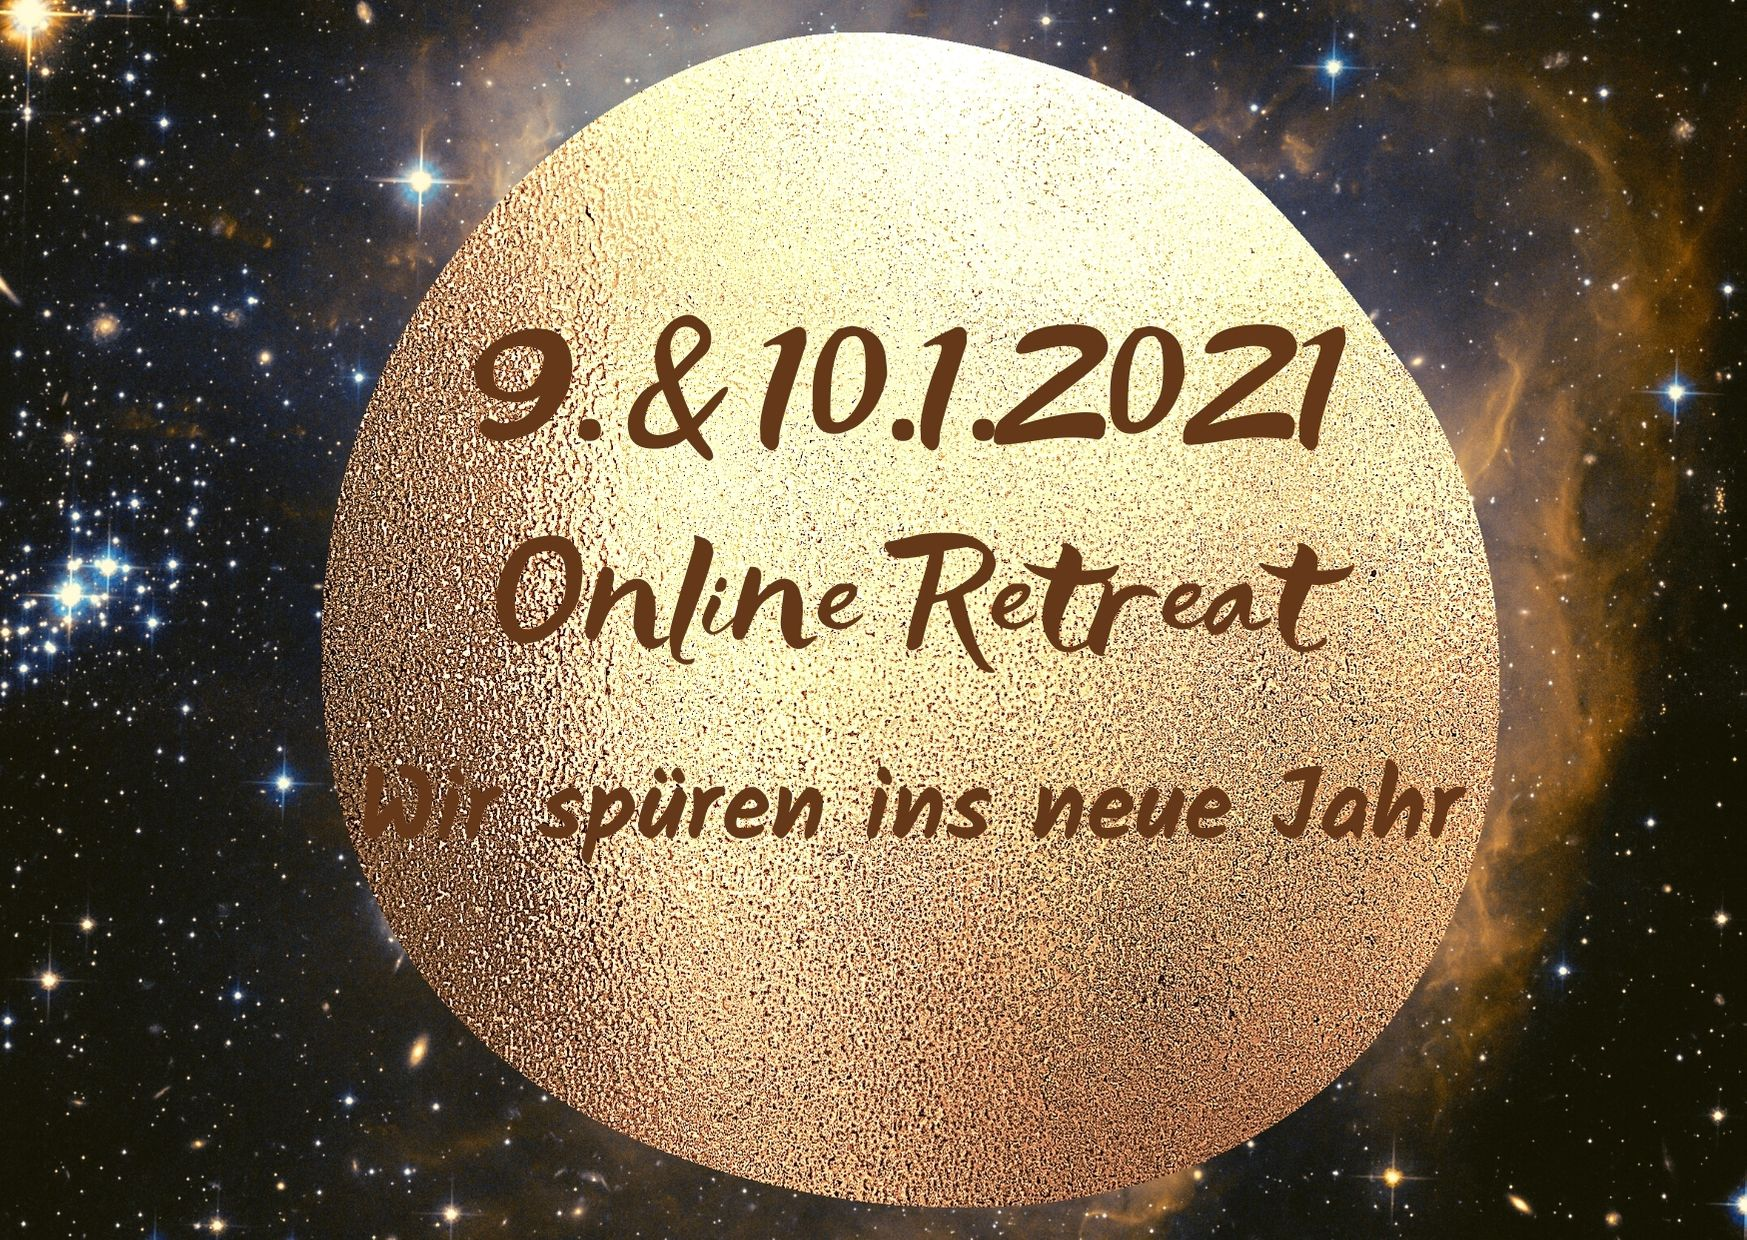 online retreat, theory U. Theorie U. Theorie U Retreat, ins neue Jahr spüren , Petra Prosoparis, serving life